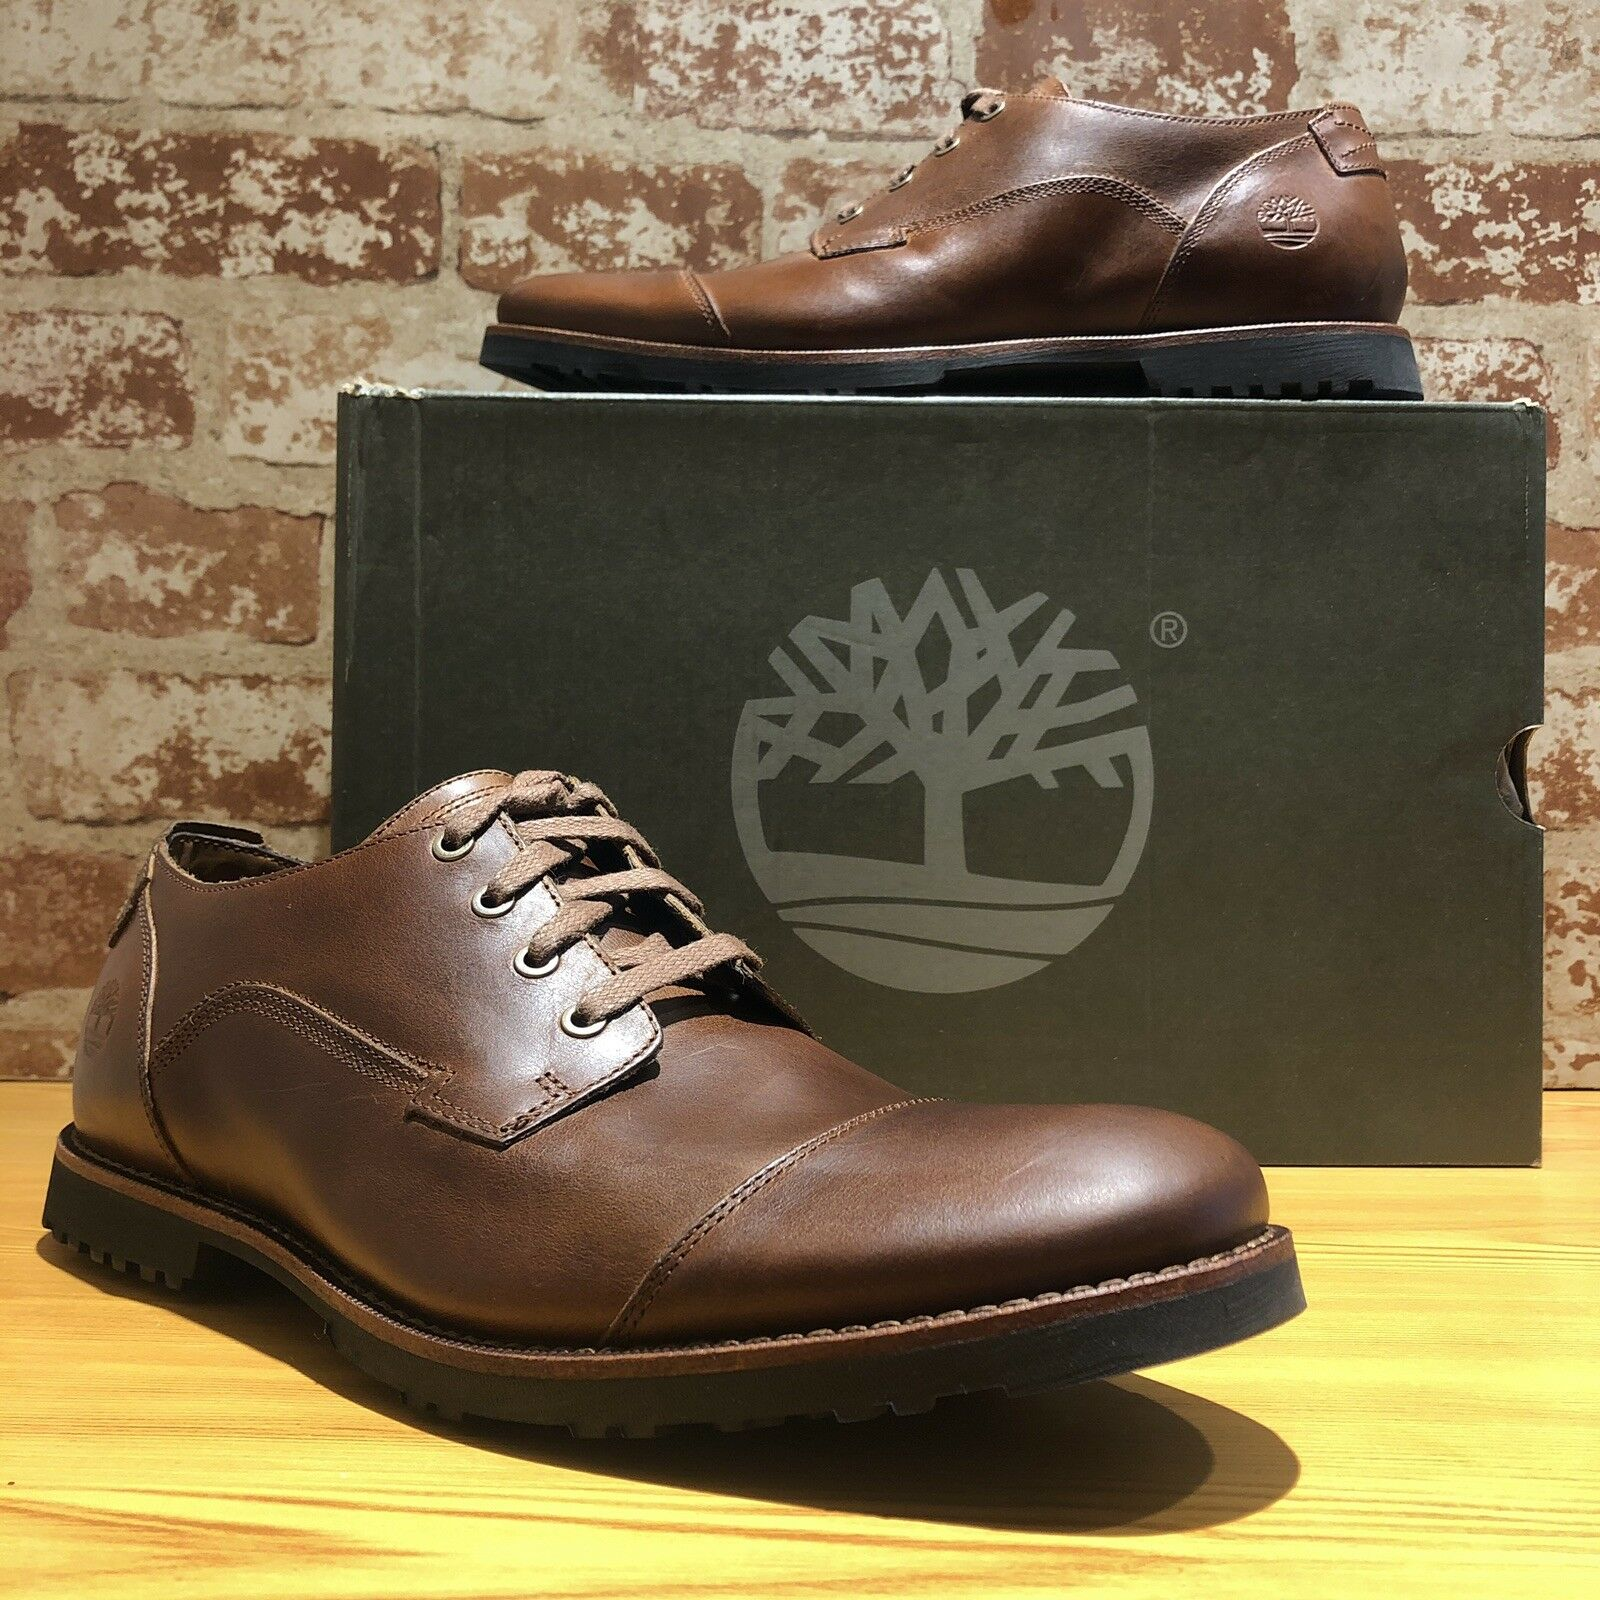 255c77bfab0 Timberland Tb0a1ndi919 Kendrick Tan Harness Men's Oxford Shoes Size 9 US